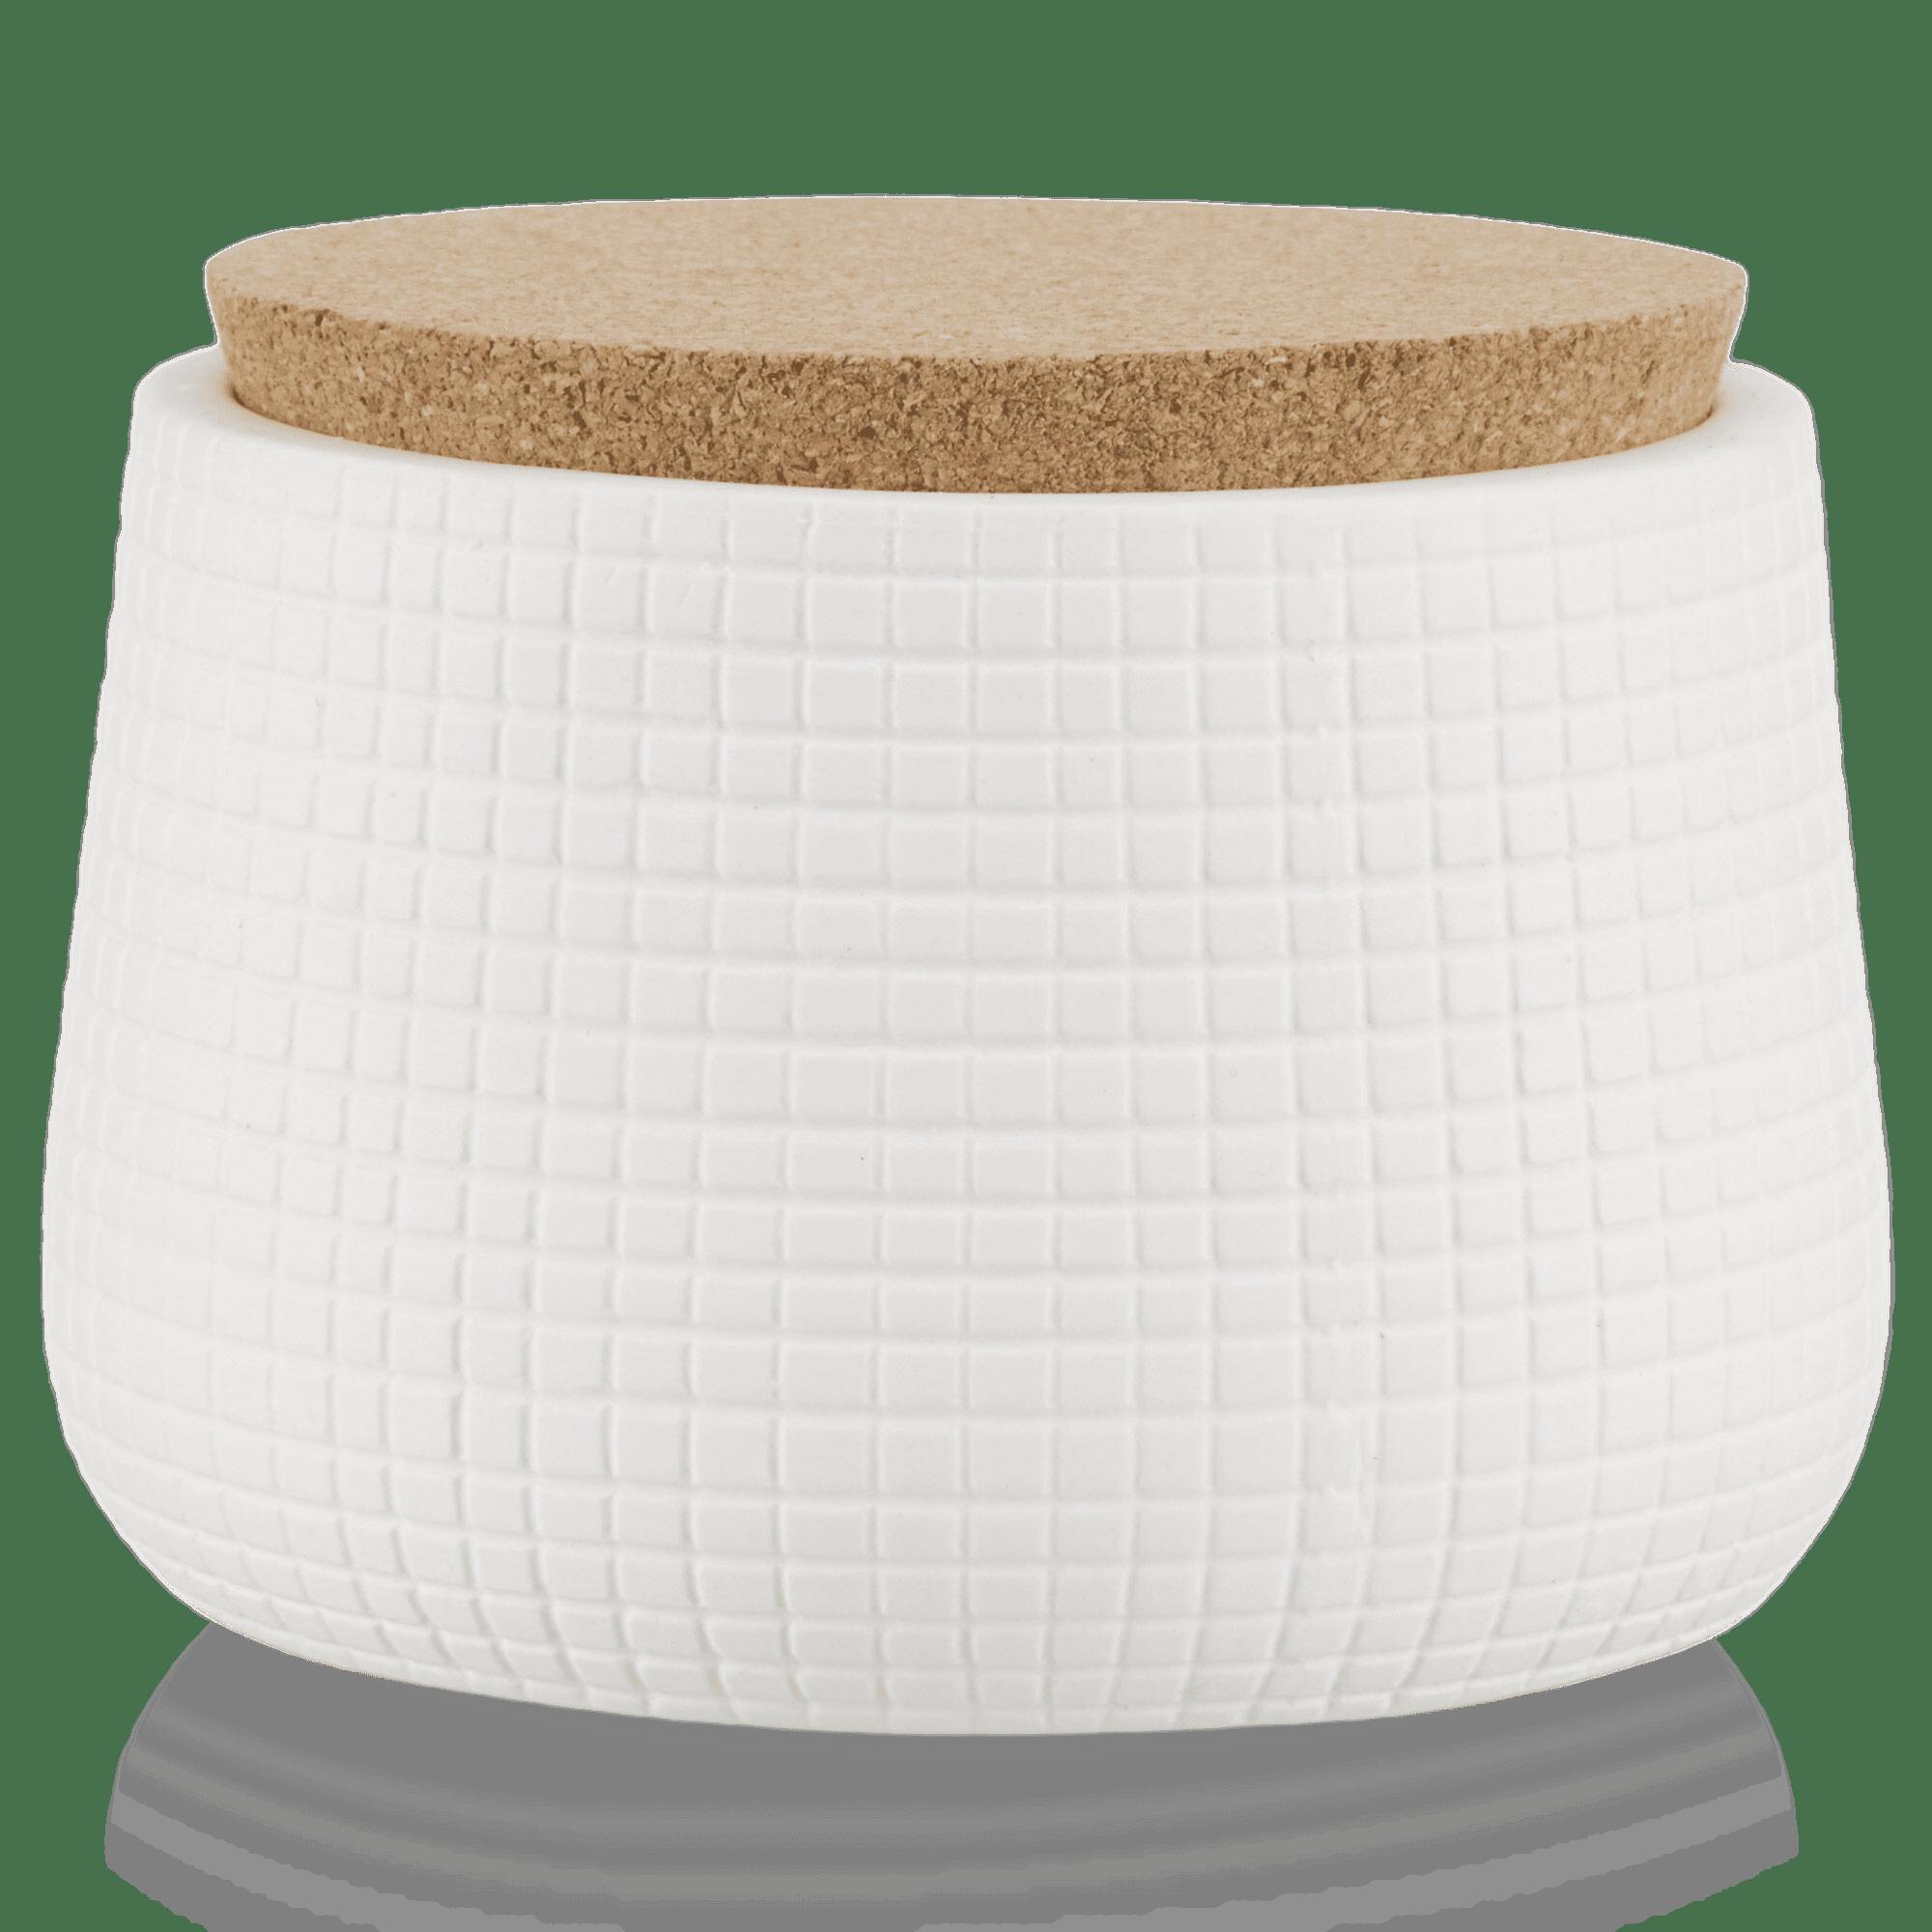 Ceramic Jar with Cork Lid